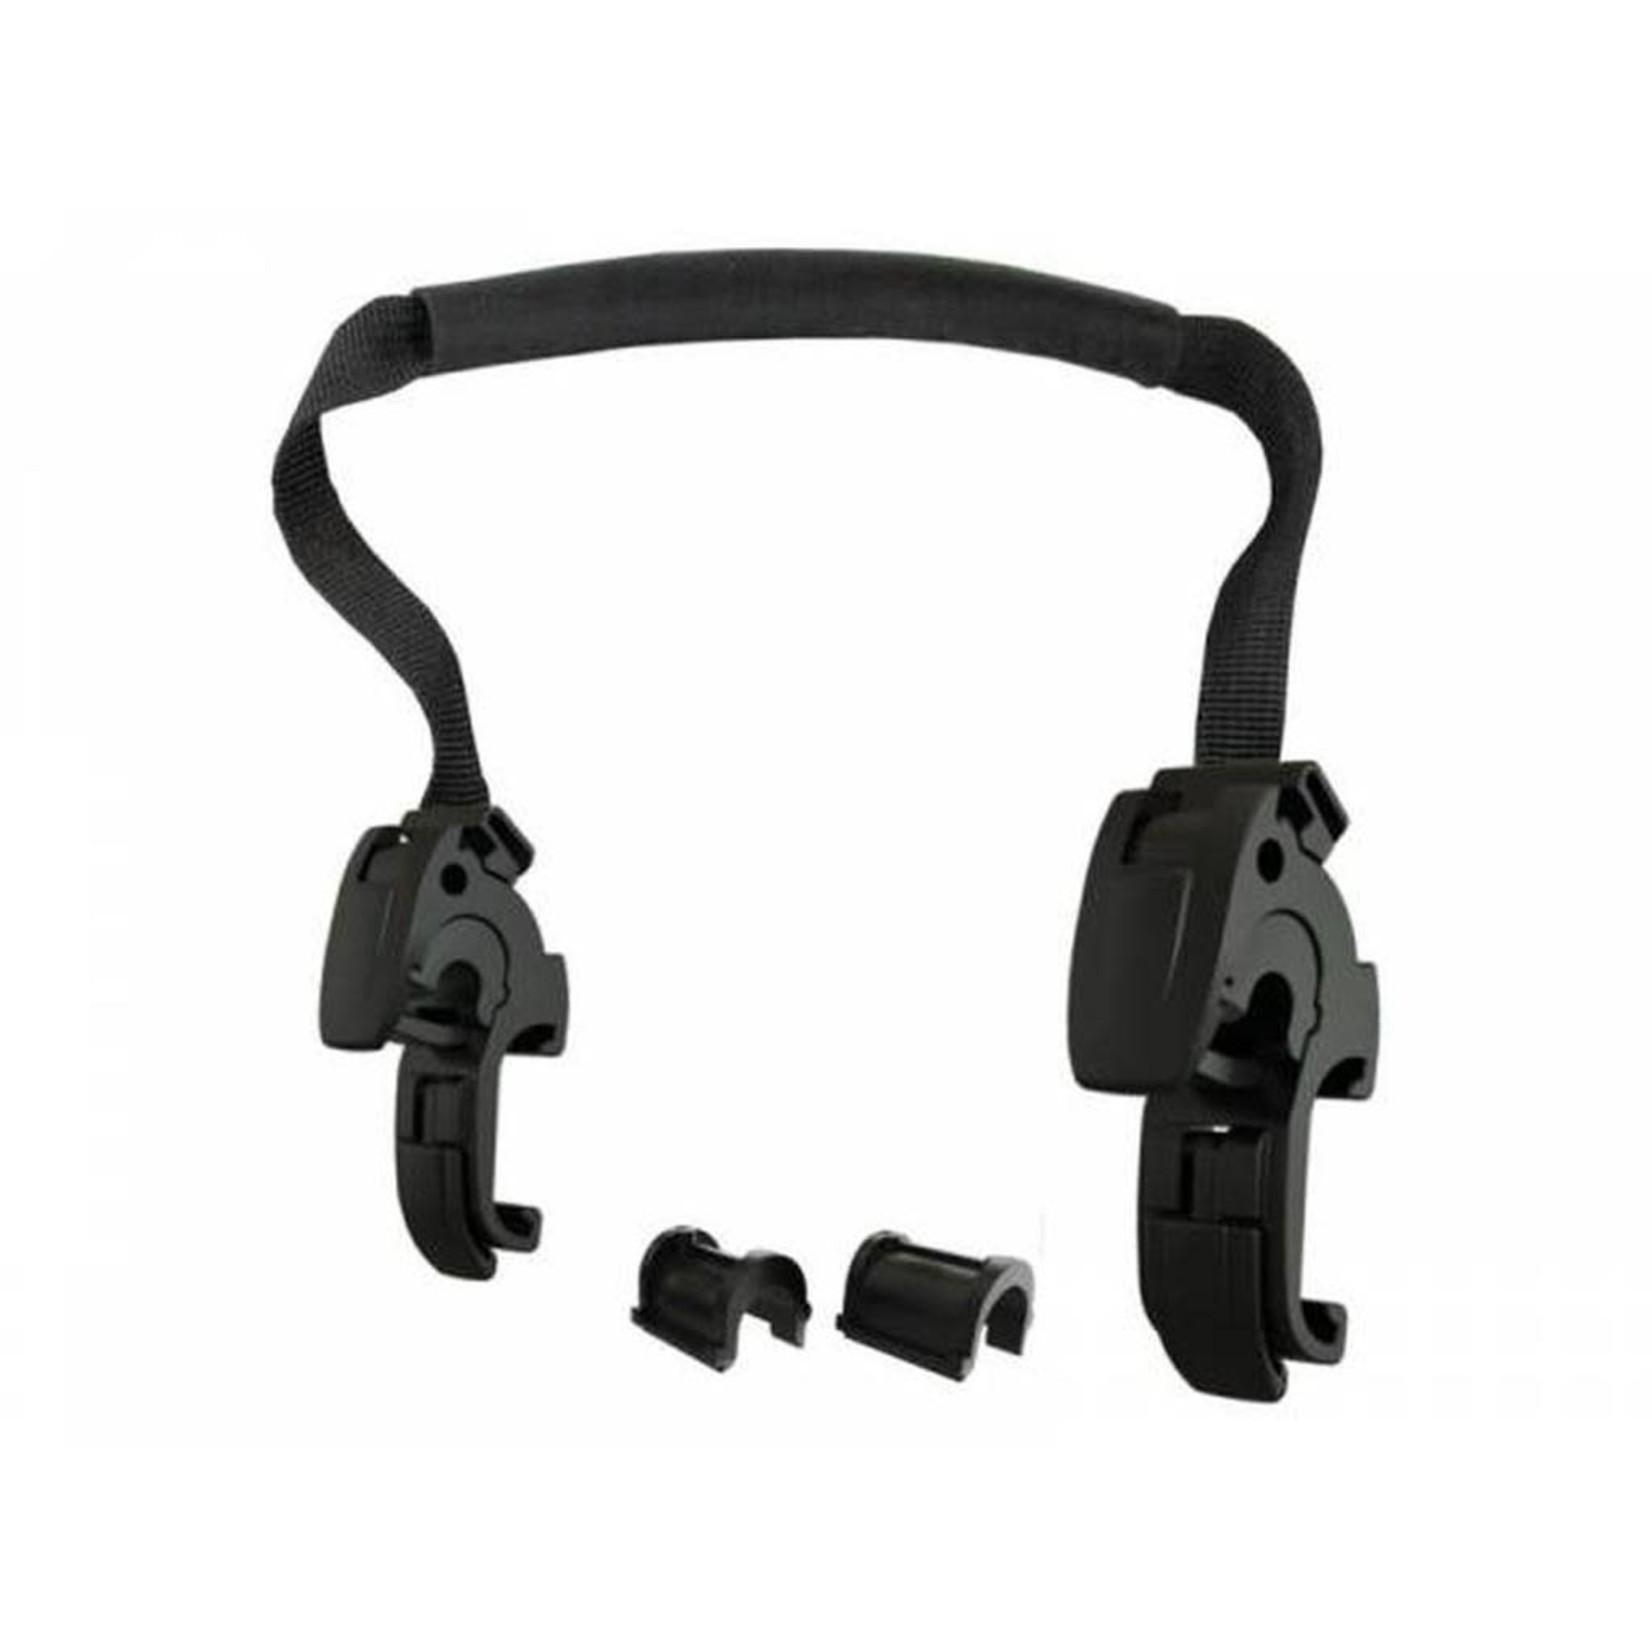 Ortlieb Ortlieb QL2.1 Hooks with Adjustable Handle